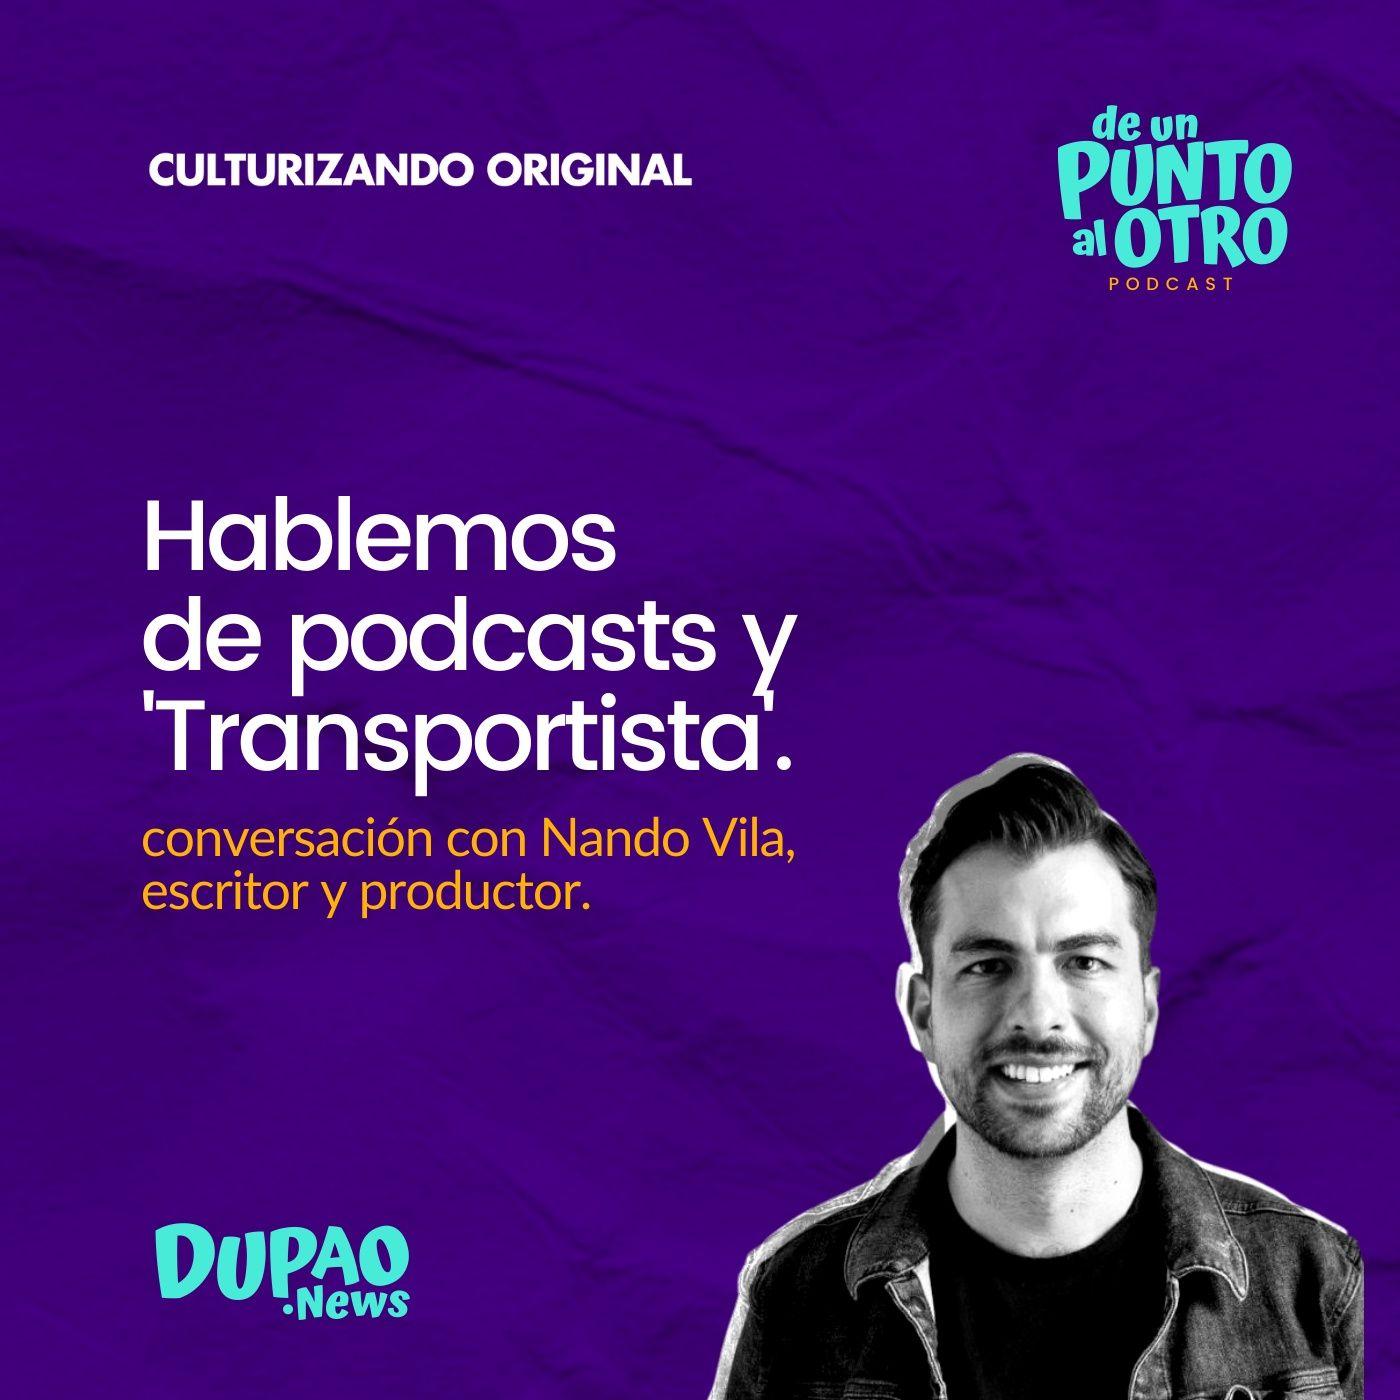 E44 • Hablemos de podcasts... y 'Transportista', con Nando Vila • DUPAO.news